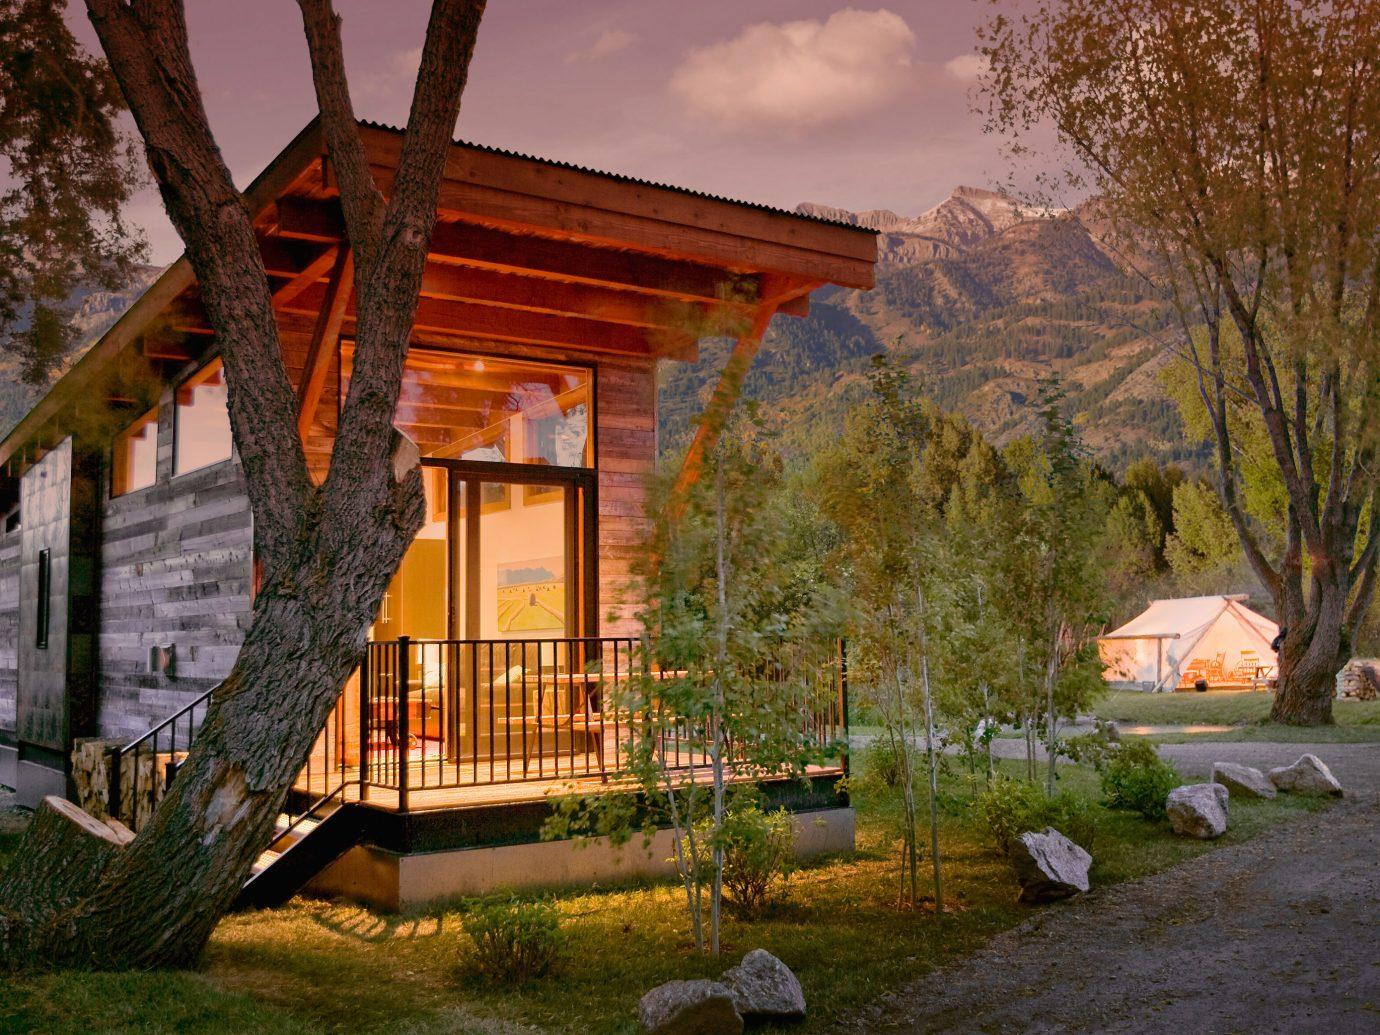 exterior view of Fireside Resort